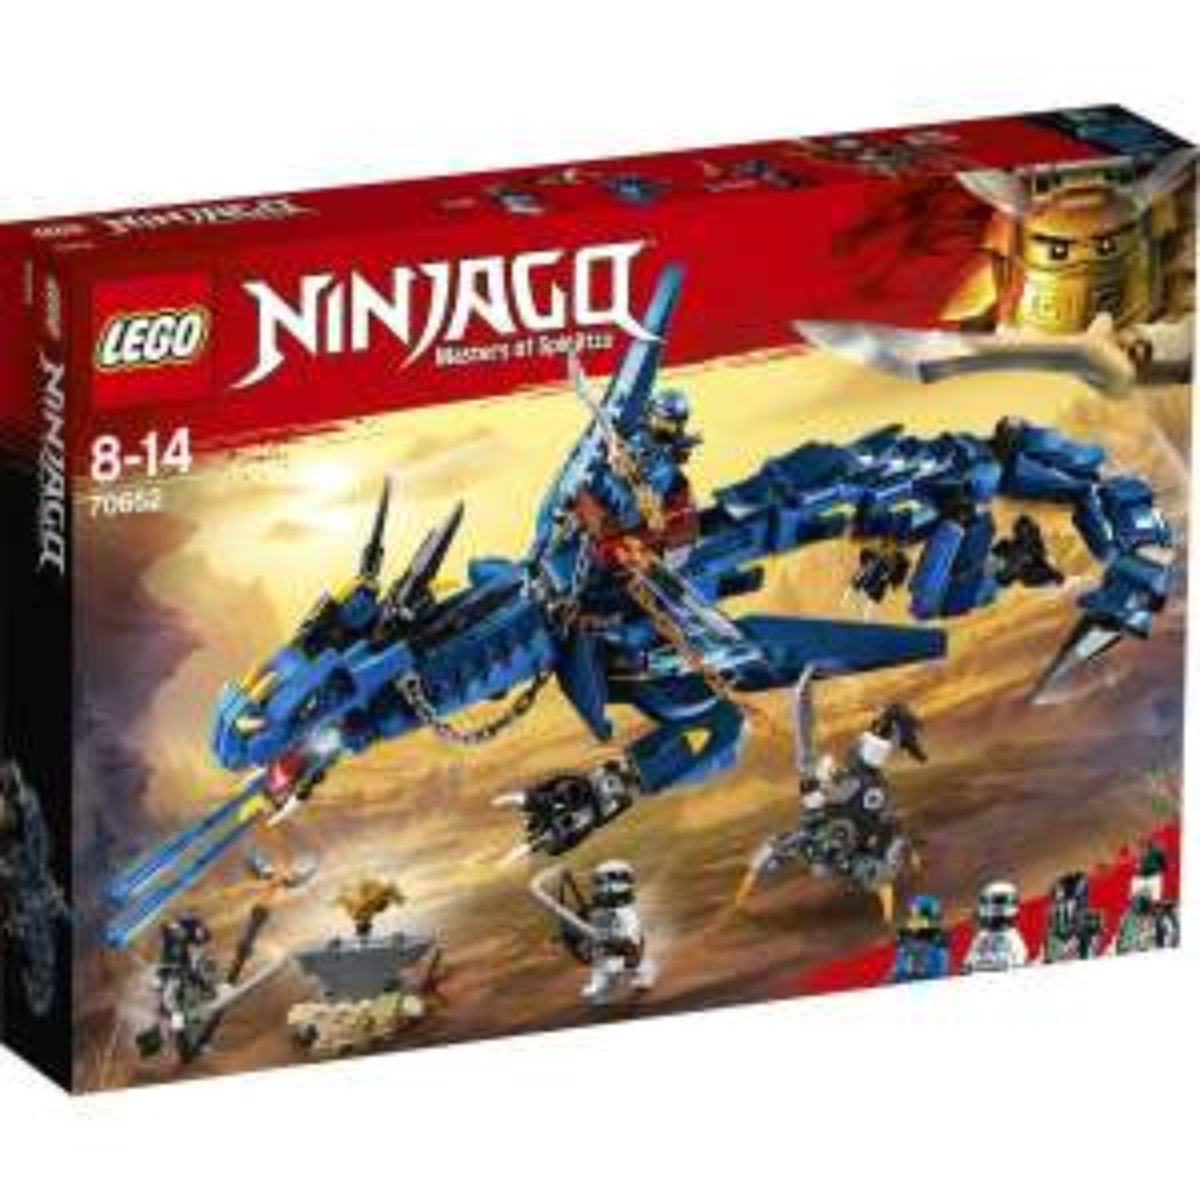 Lego 70652 Ninjago Stormbringer - £20 @ Sainsbury's